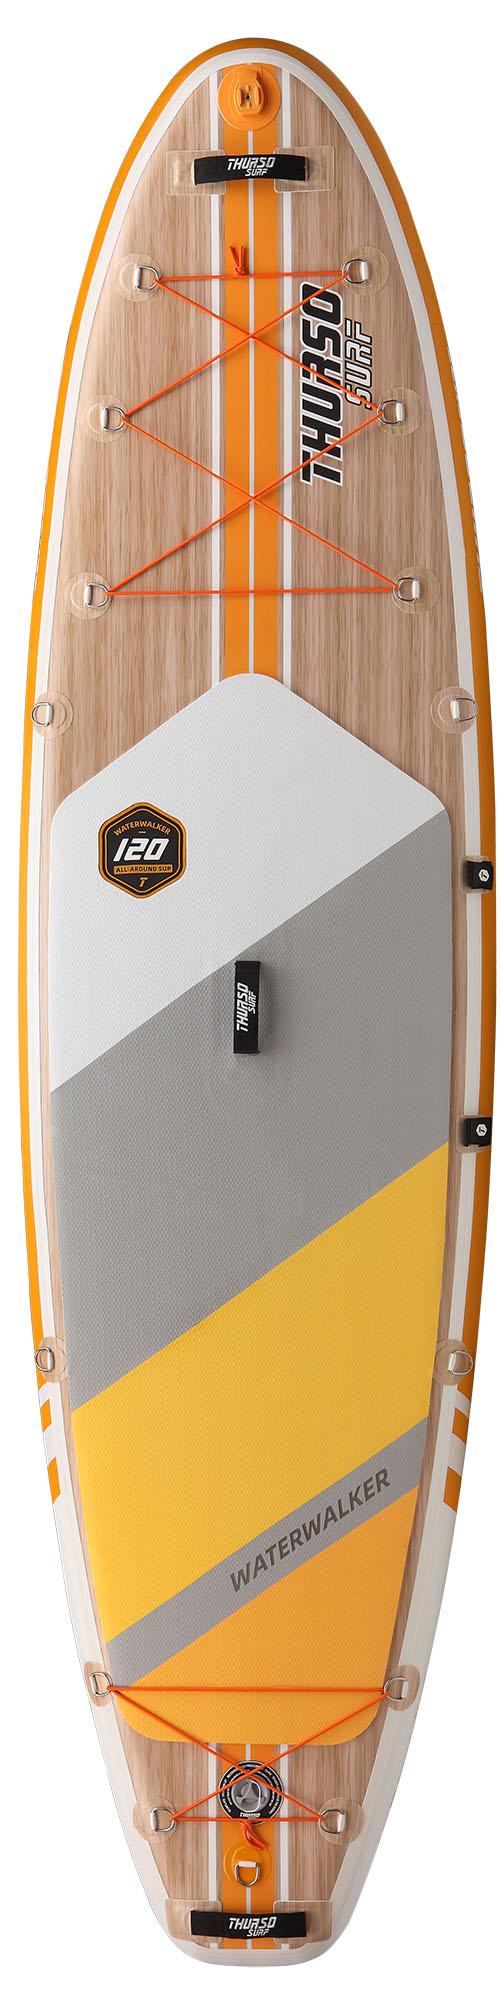 stand-up-paddle-board-waterwalker-120-tangerine-thurso-surf-vertical-2000.jpg